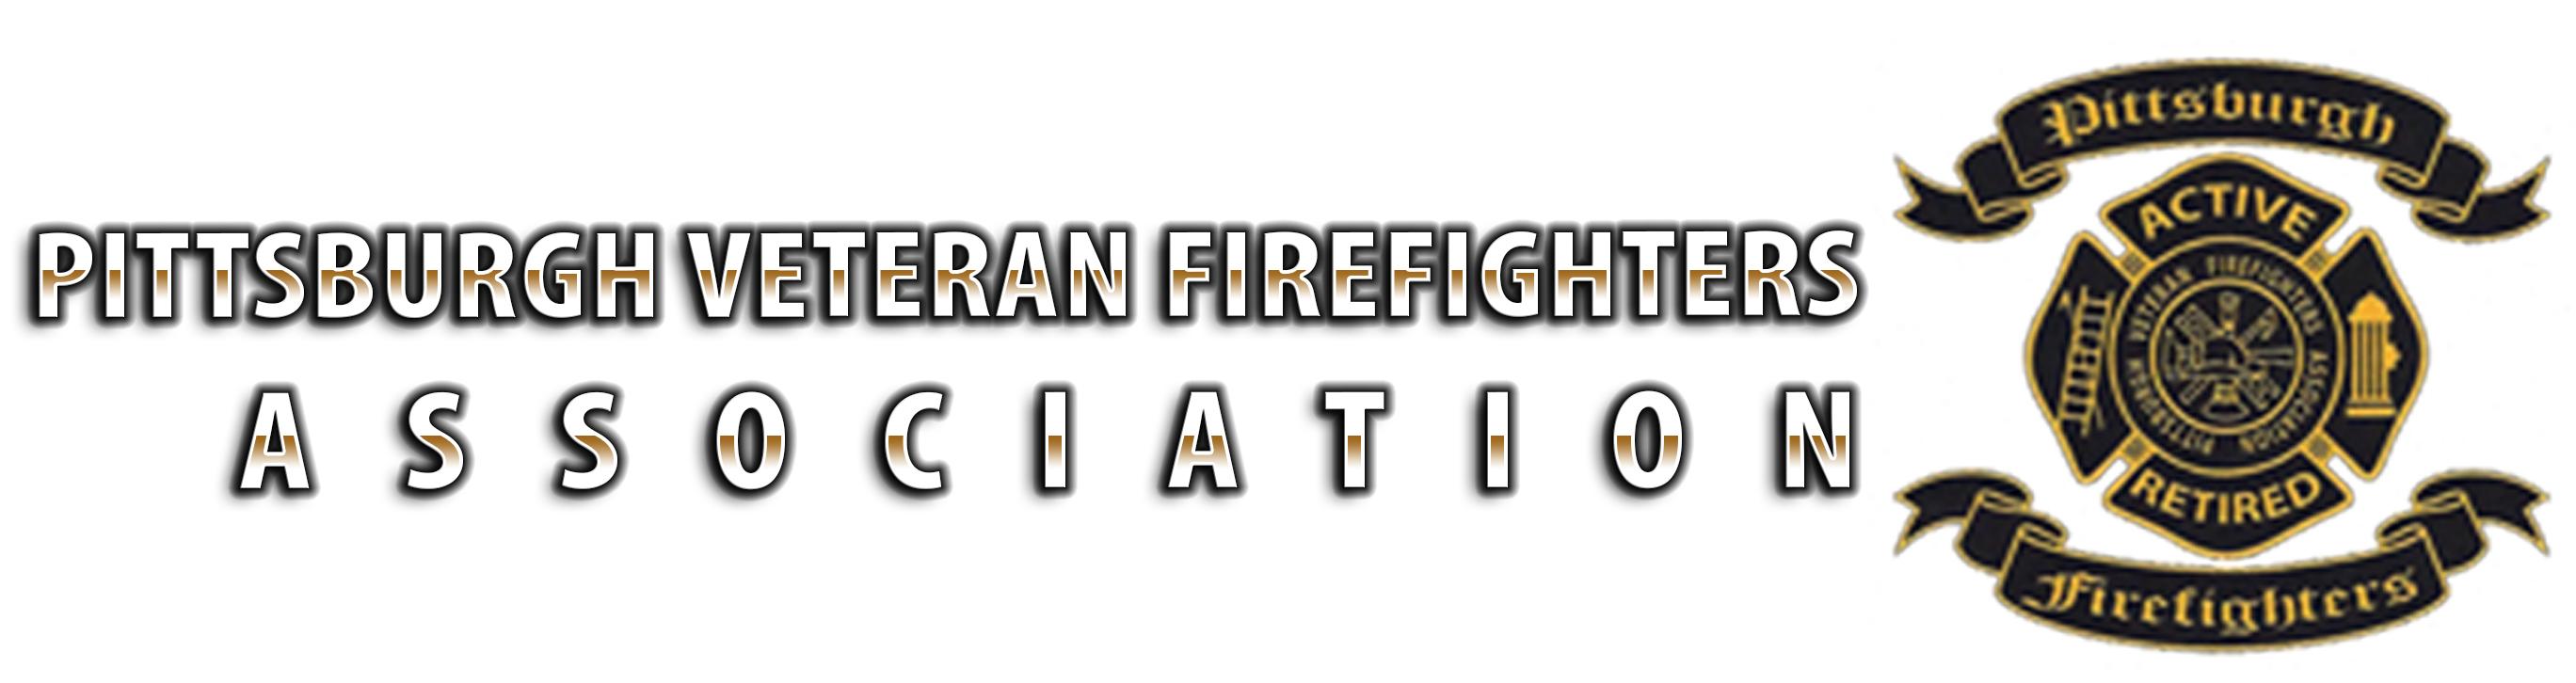 Pittsburgh Veteran Fire Fighters